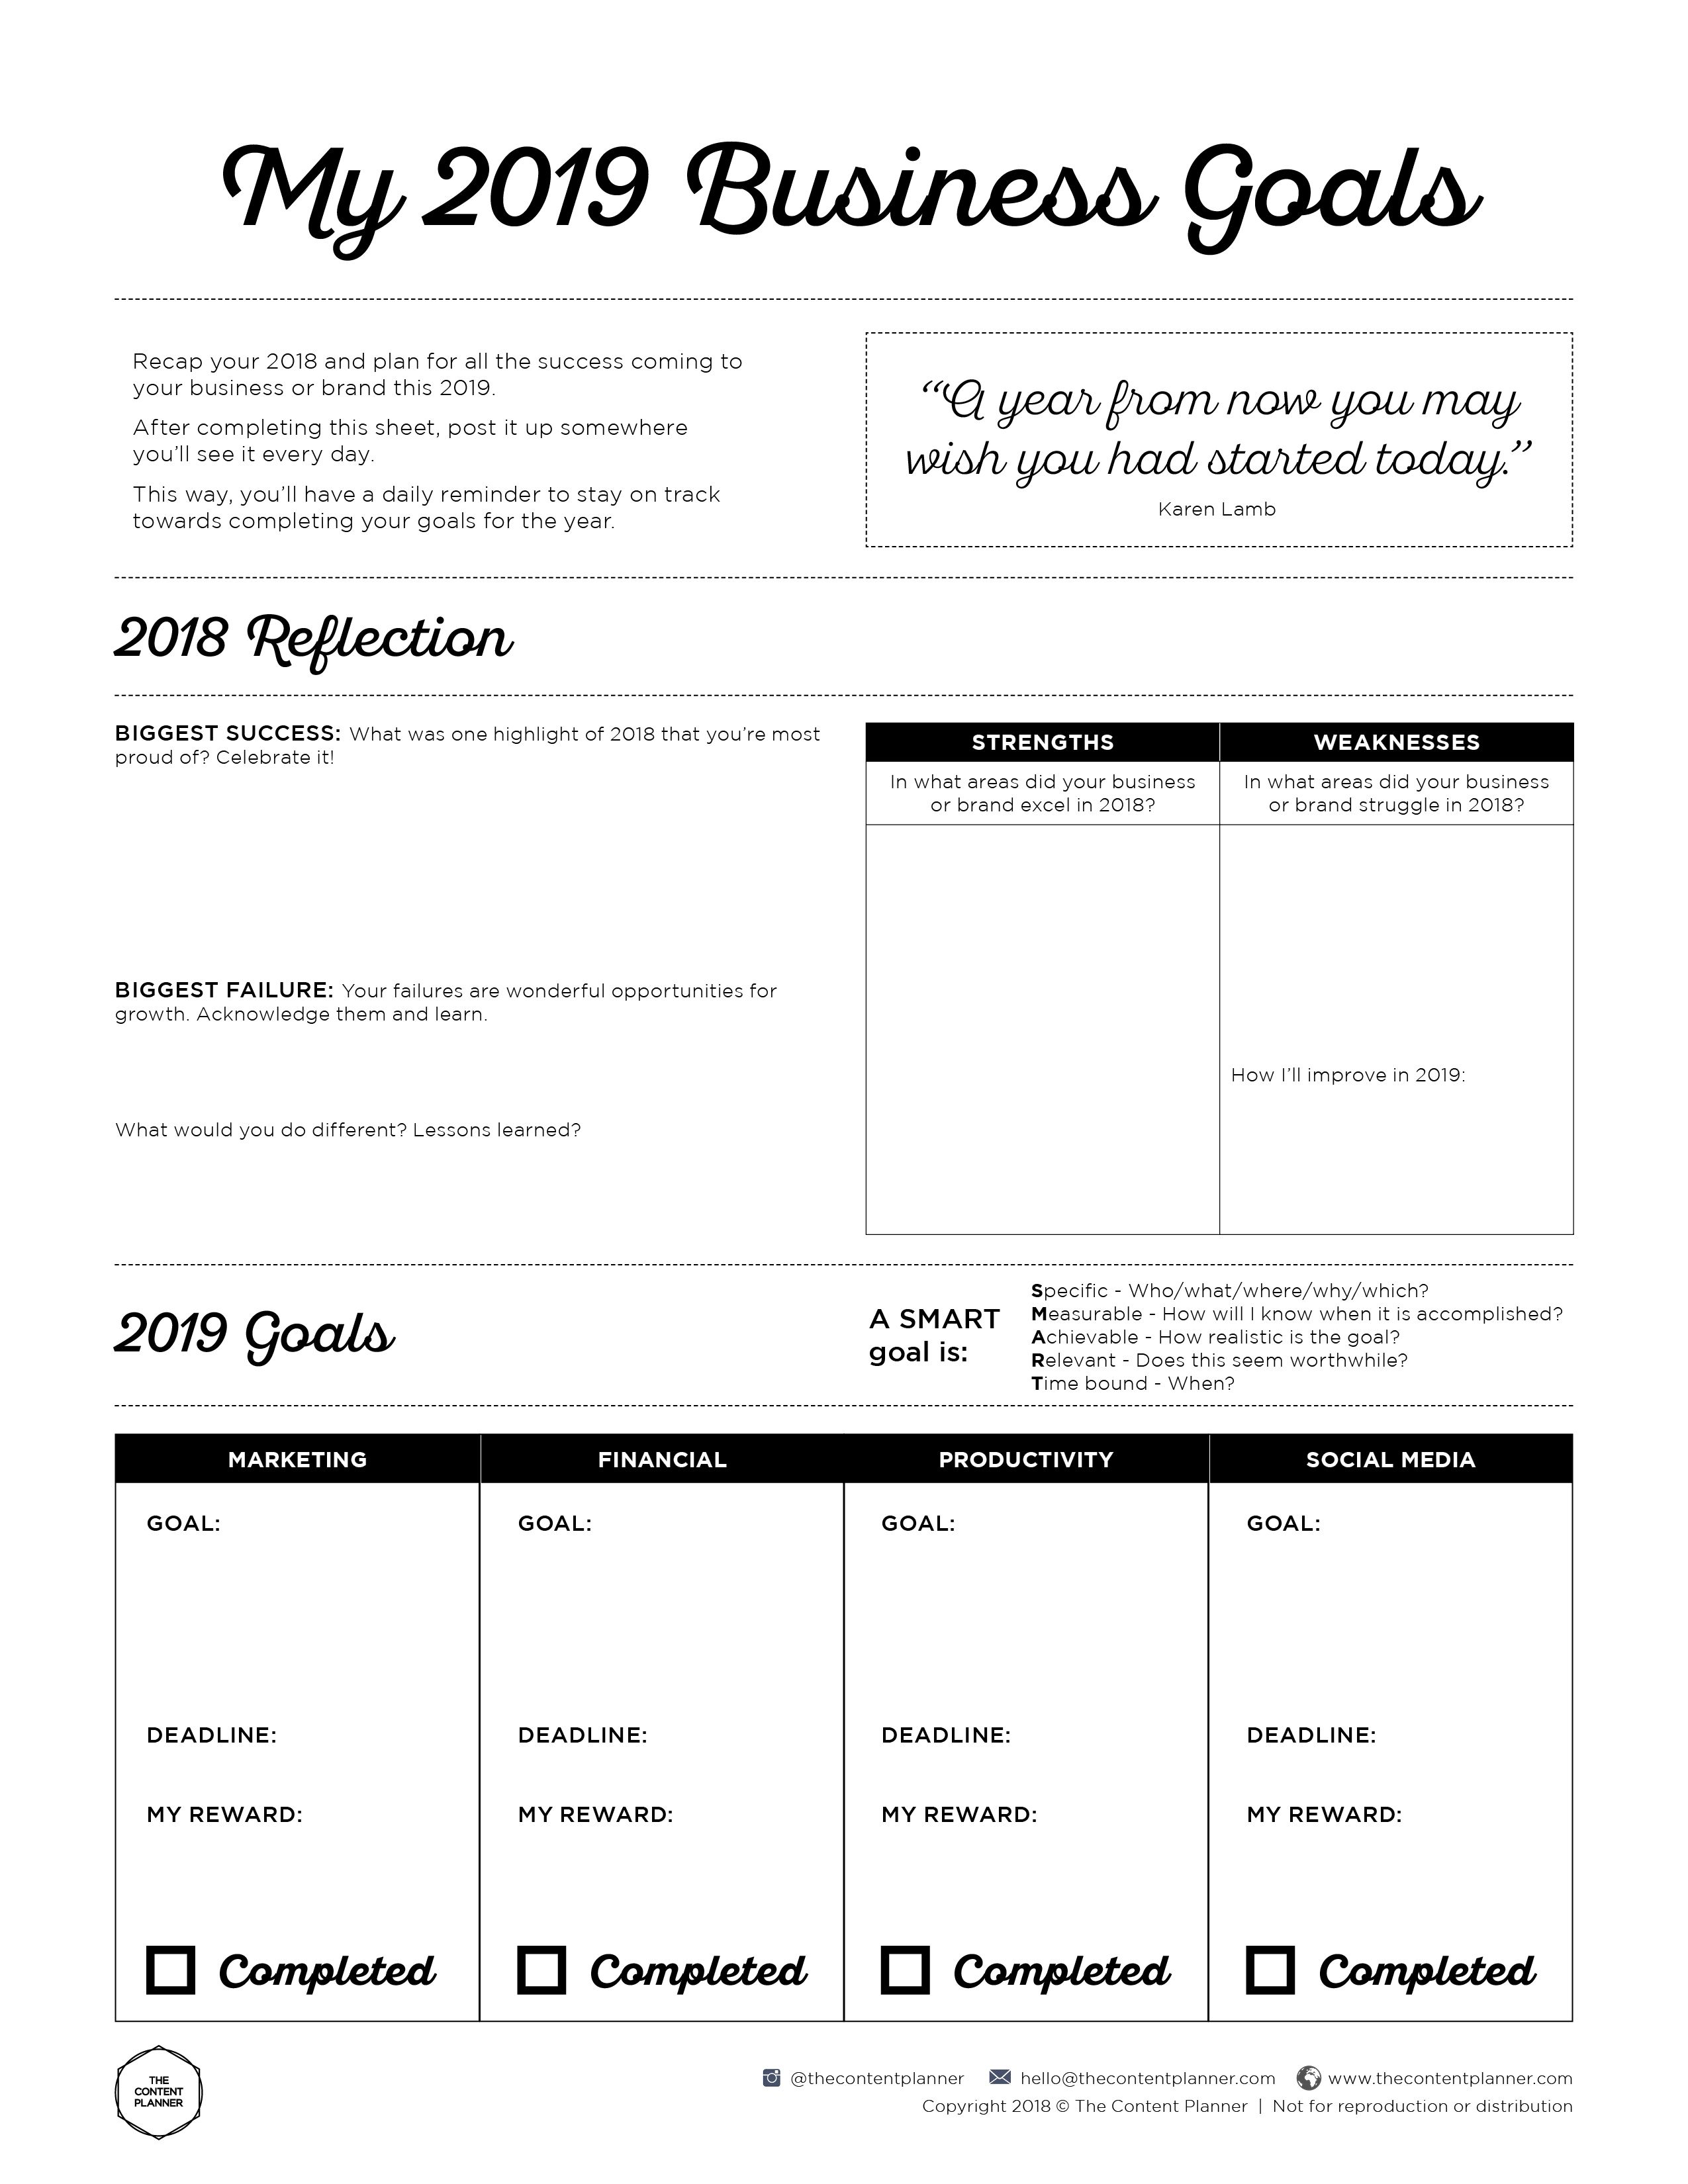 Worksheet. grademathhomeworkworksheetsst printable